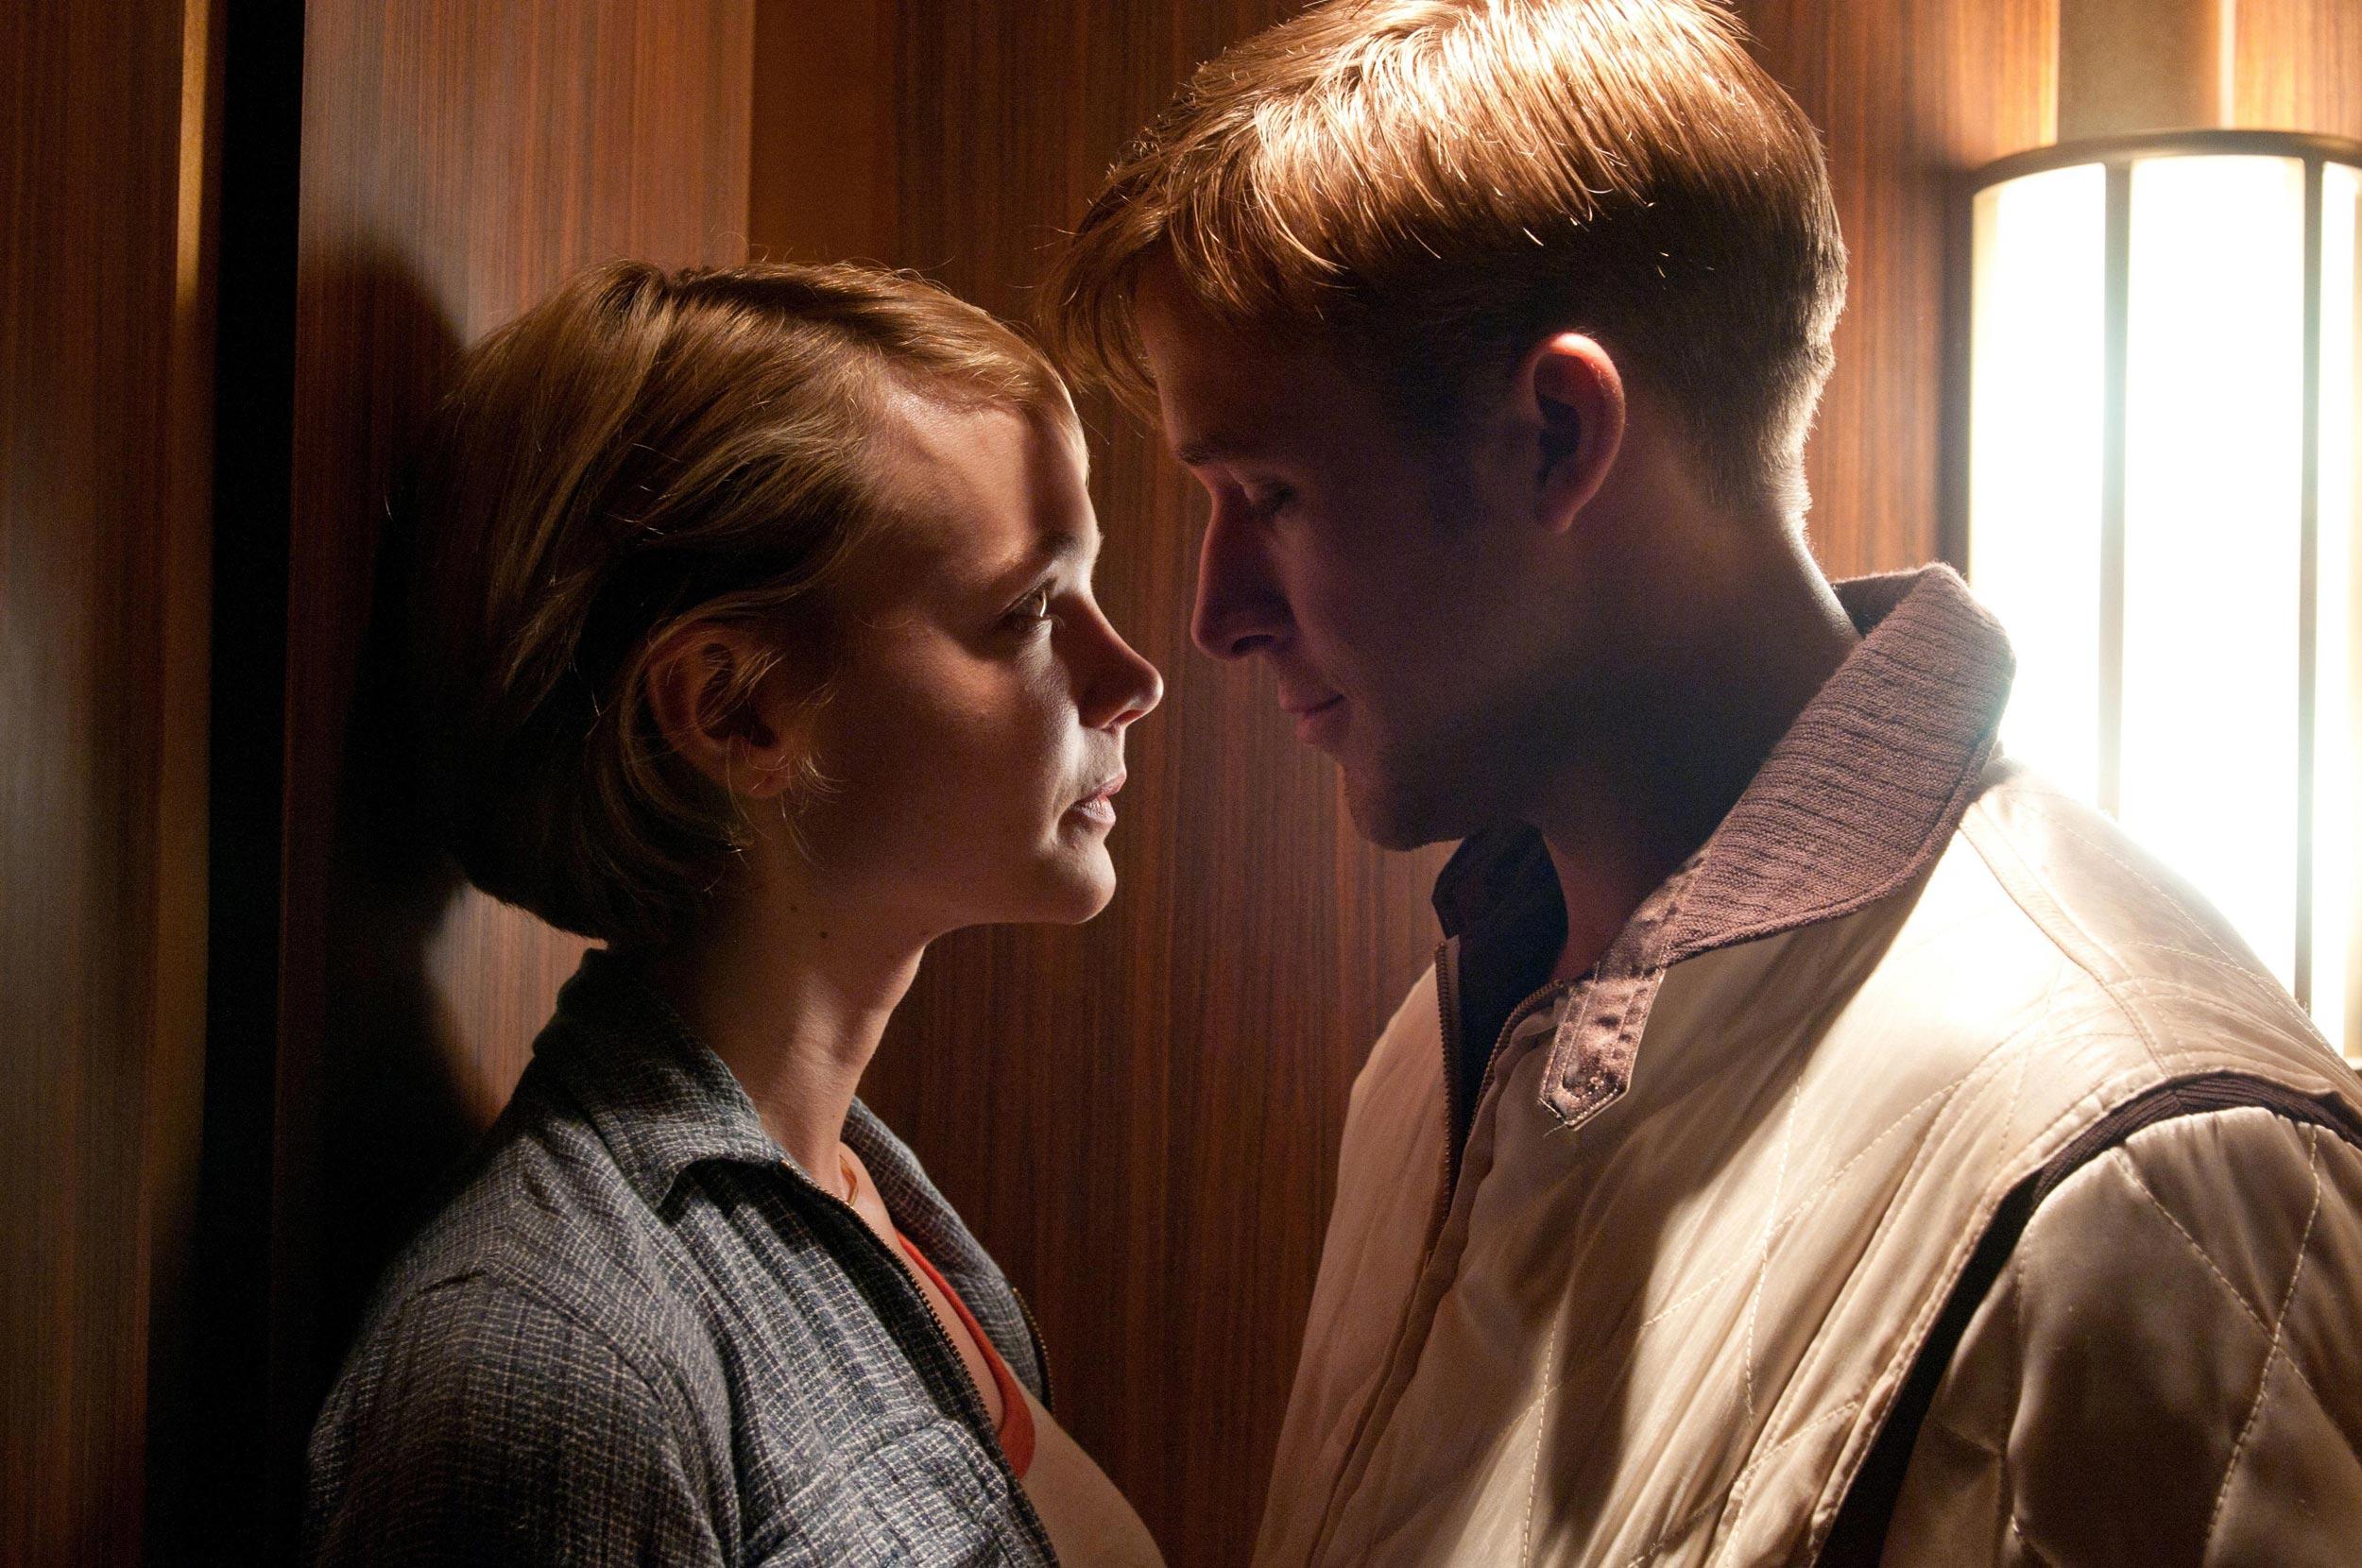 Ryan Gosling and Carey Mulligan